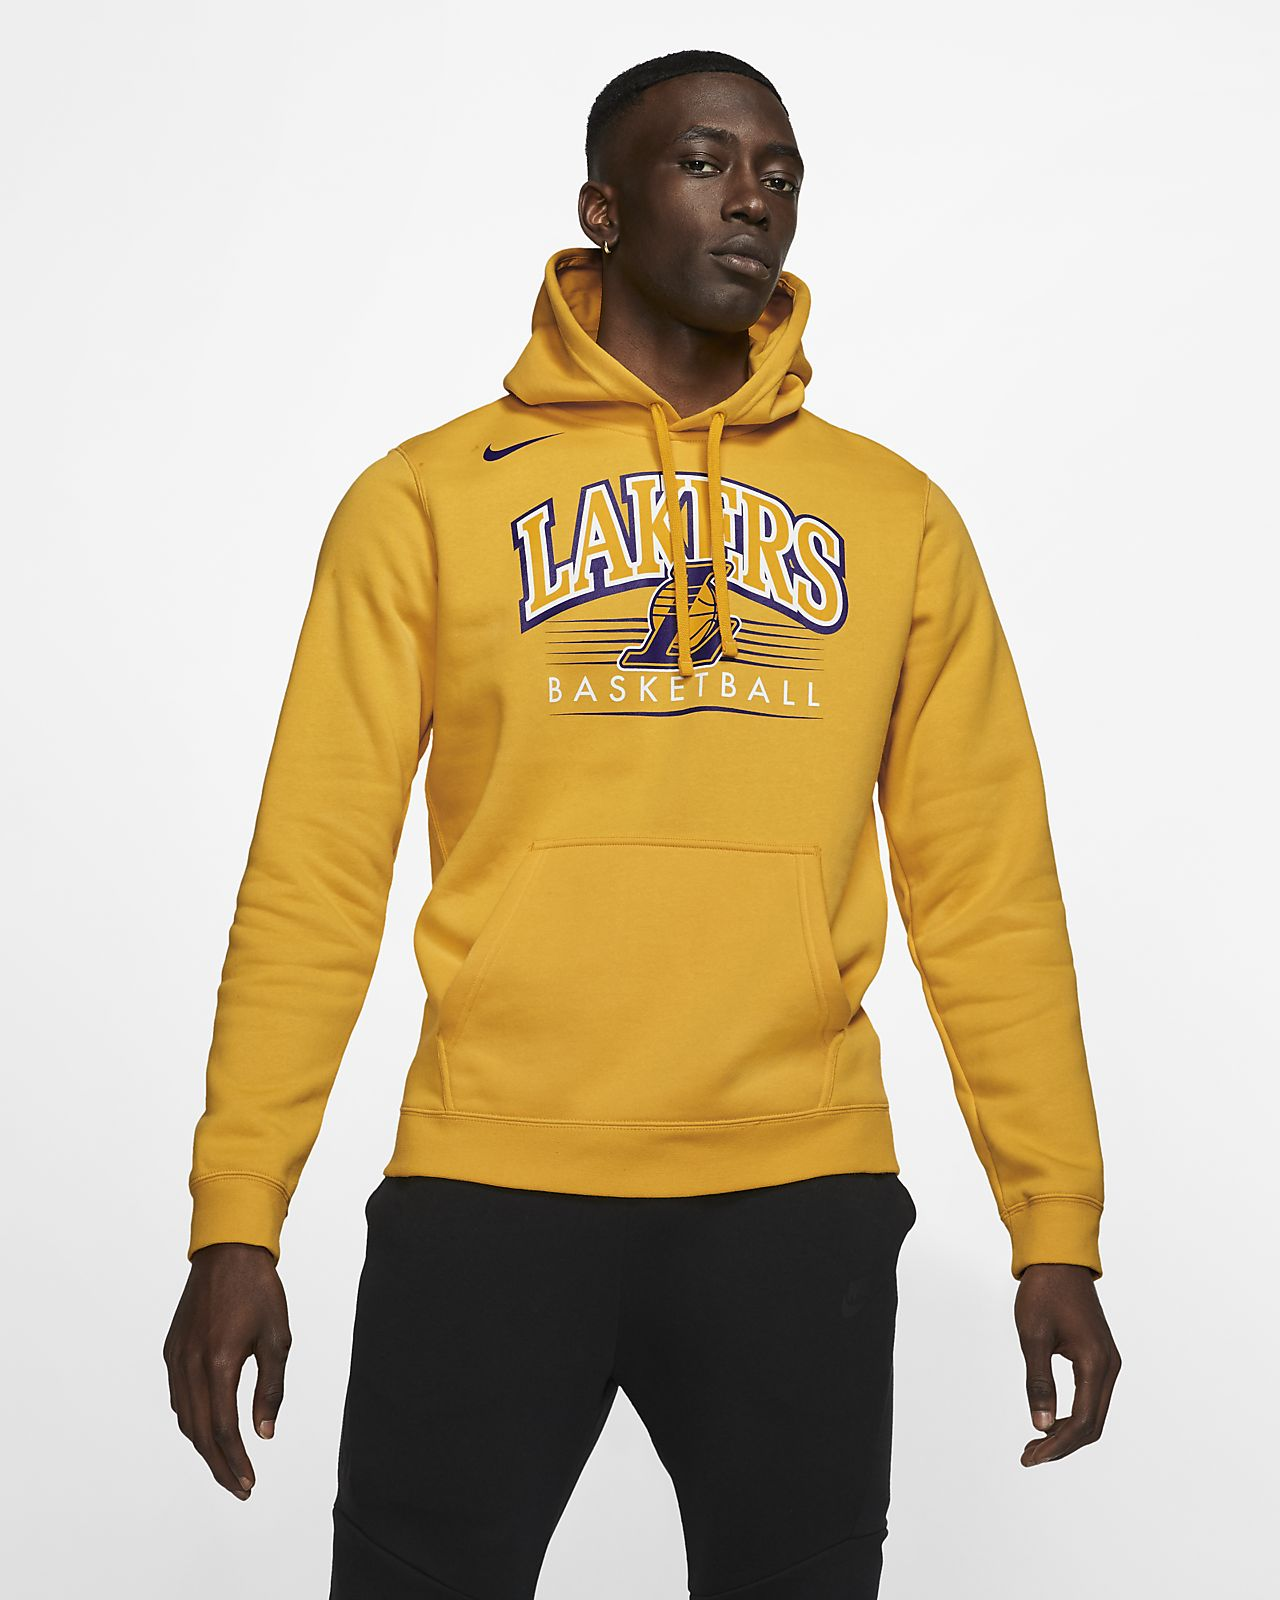 Nike Lakers Los Be Nba À Homme Angeles Capuche Sweat Pour xqaYfXXv